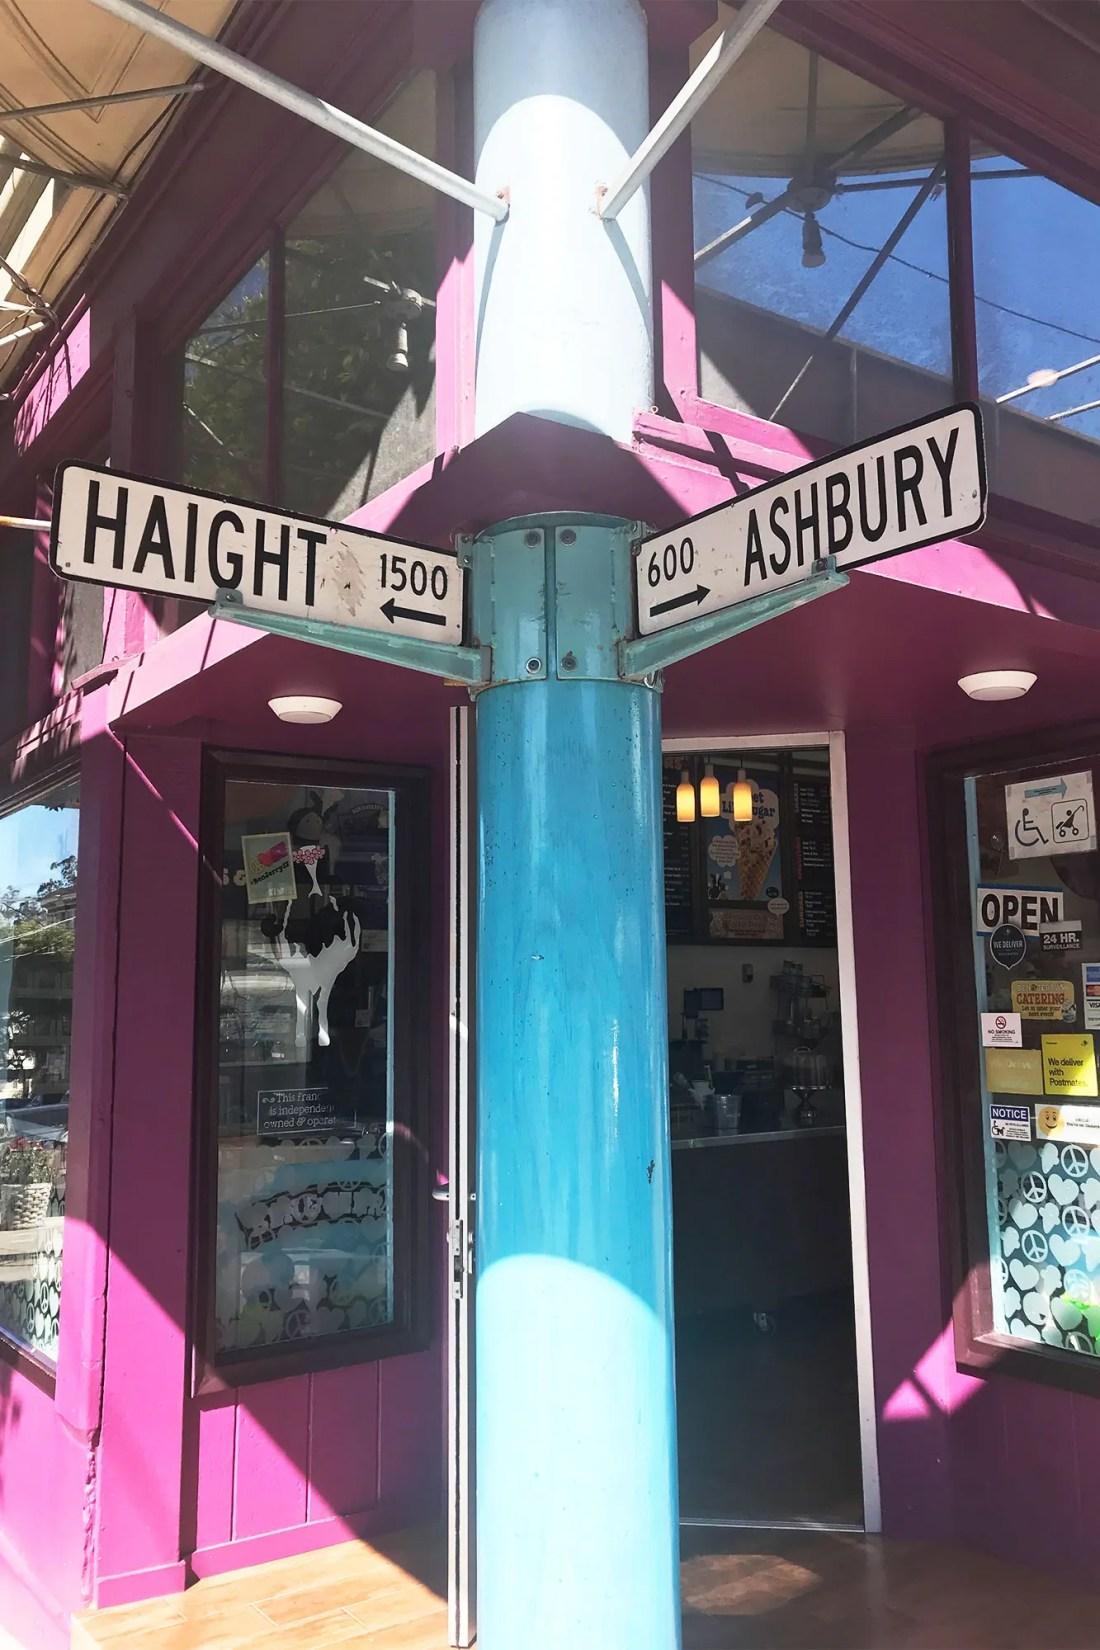 Haight Ashbury in San Francisco